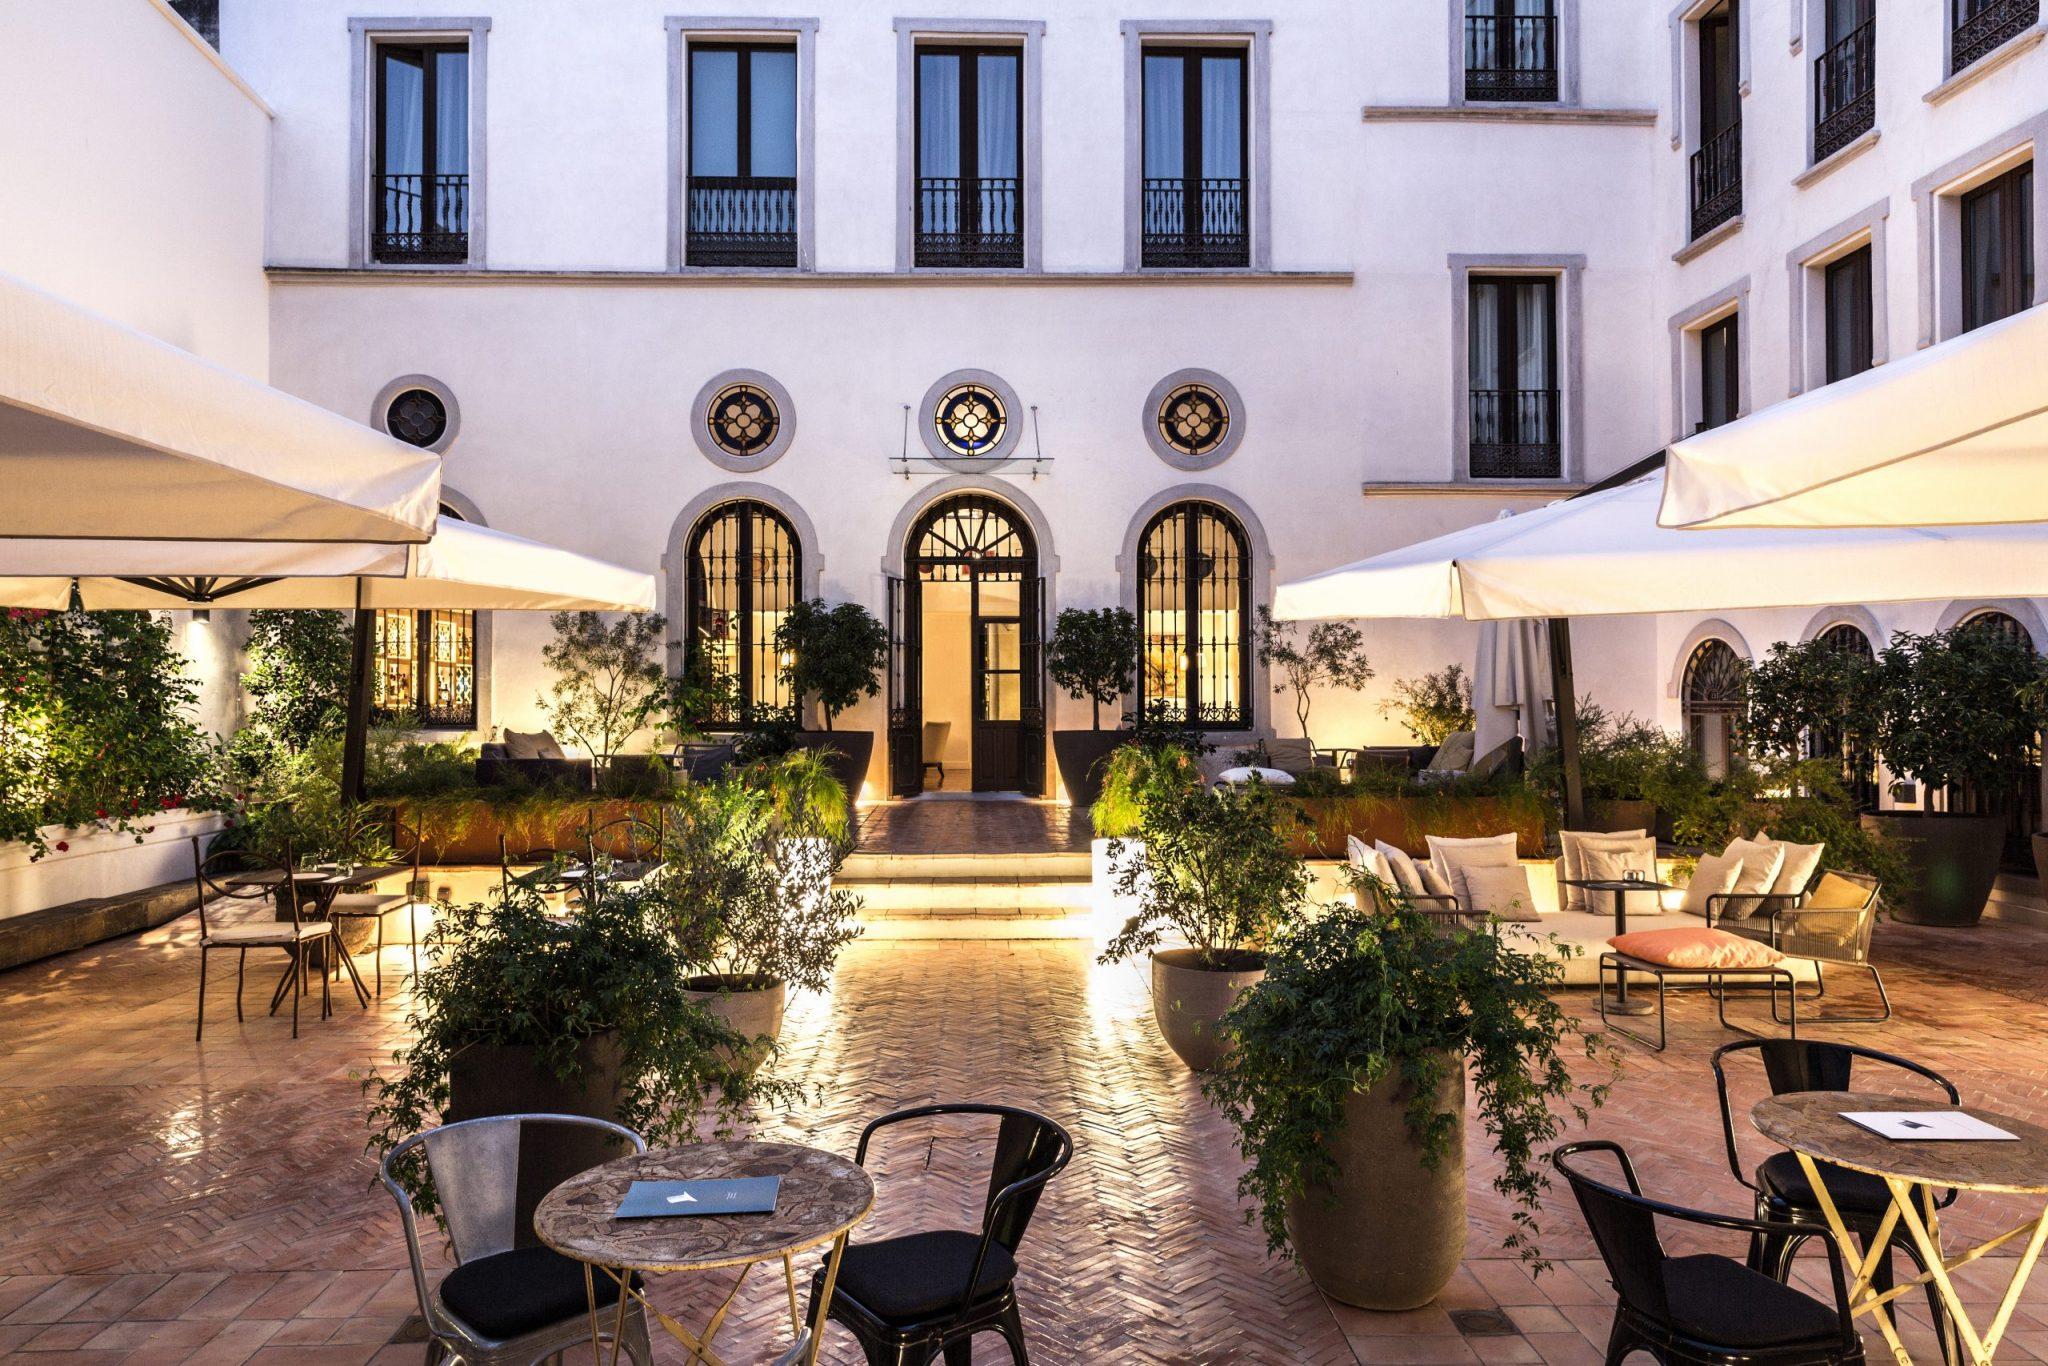 Palacio-Orange-Courtyard-1-1-scaled.jpg